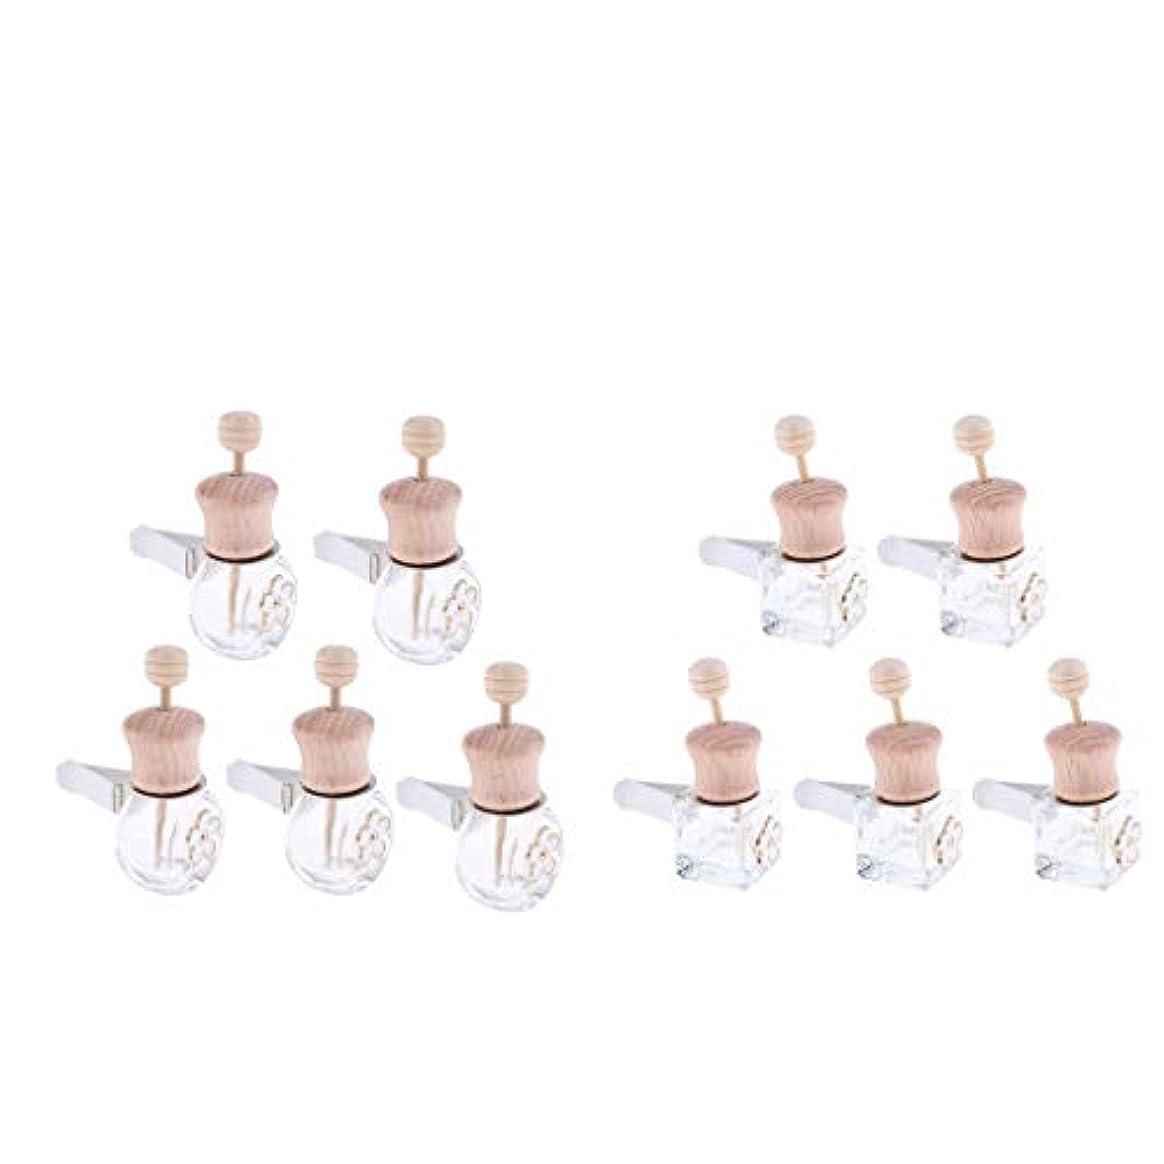 SM SunniMix 車 香水ボトル 詰め替え式 ディフューザー 8ml+6ml 装飾 雰囲気 作り出す 10個入